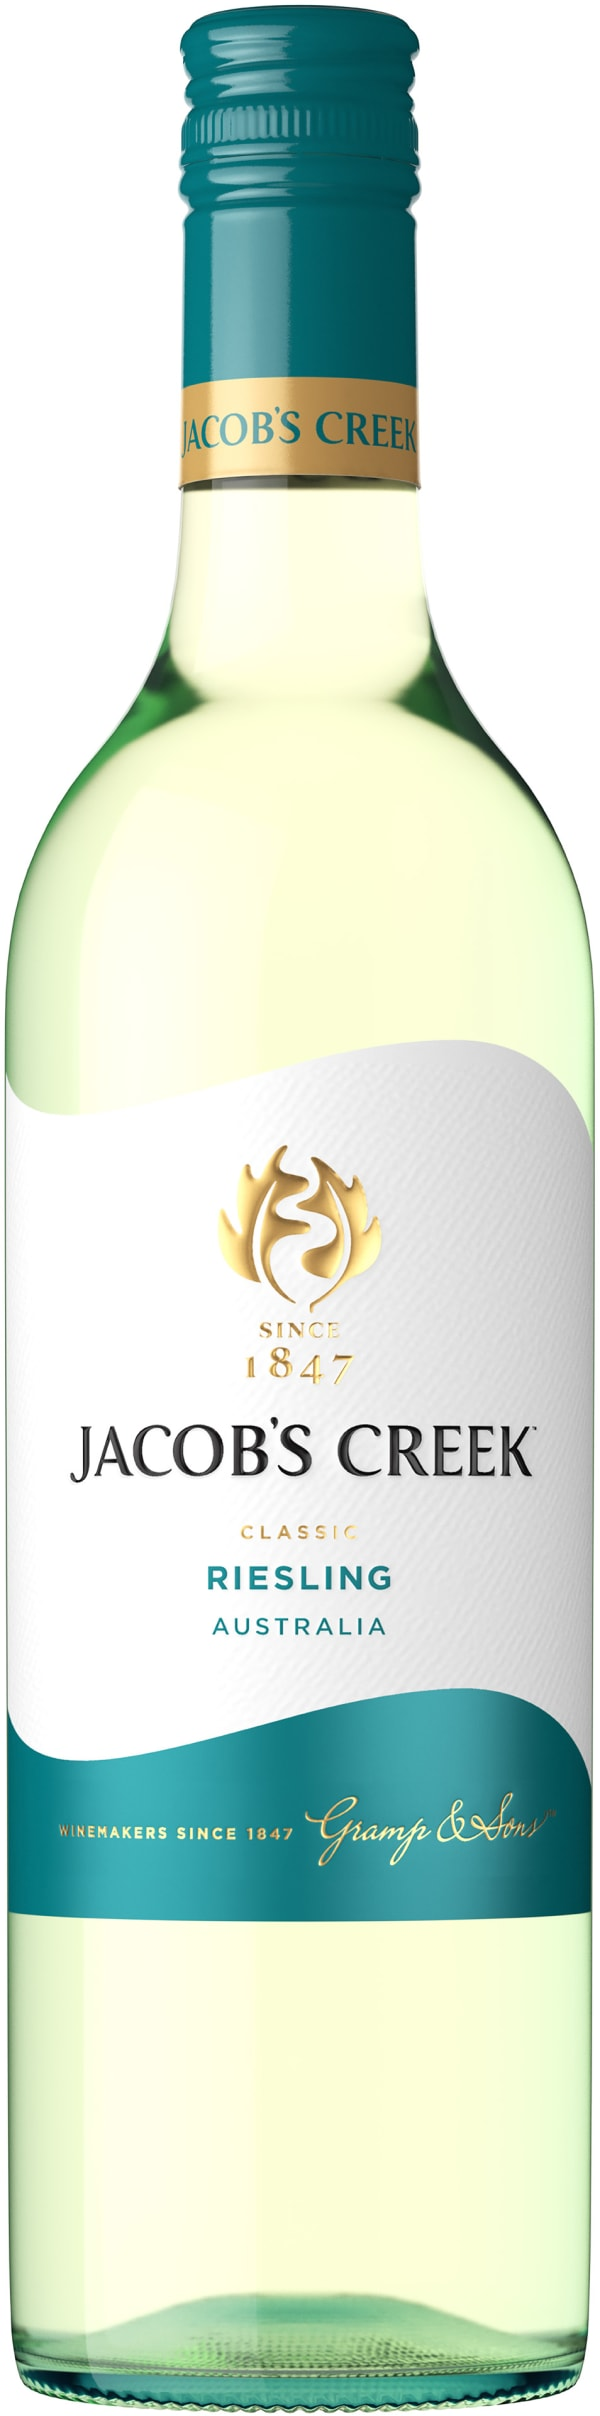 Jacob's Creek Riesling 2020